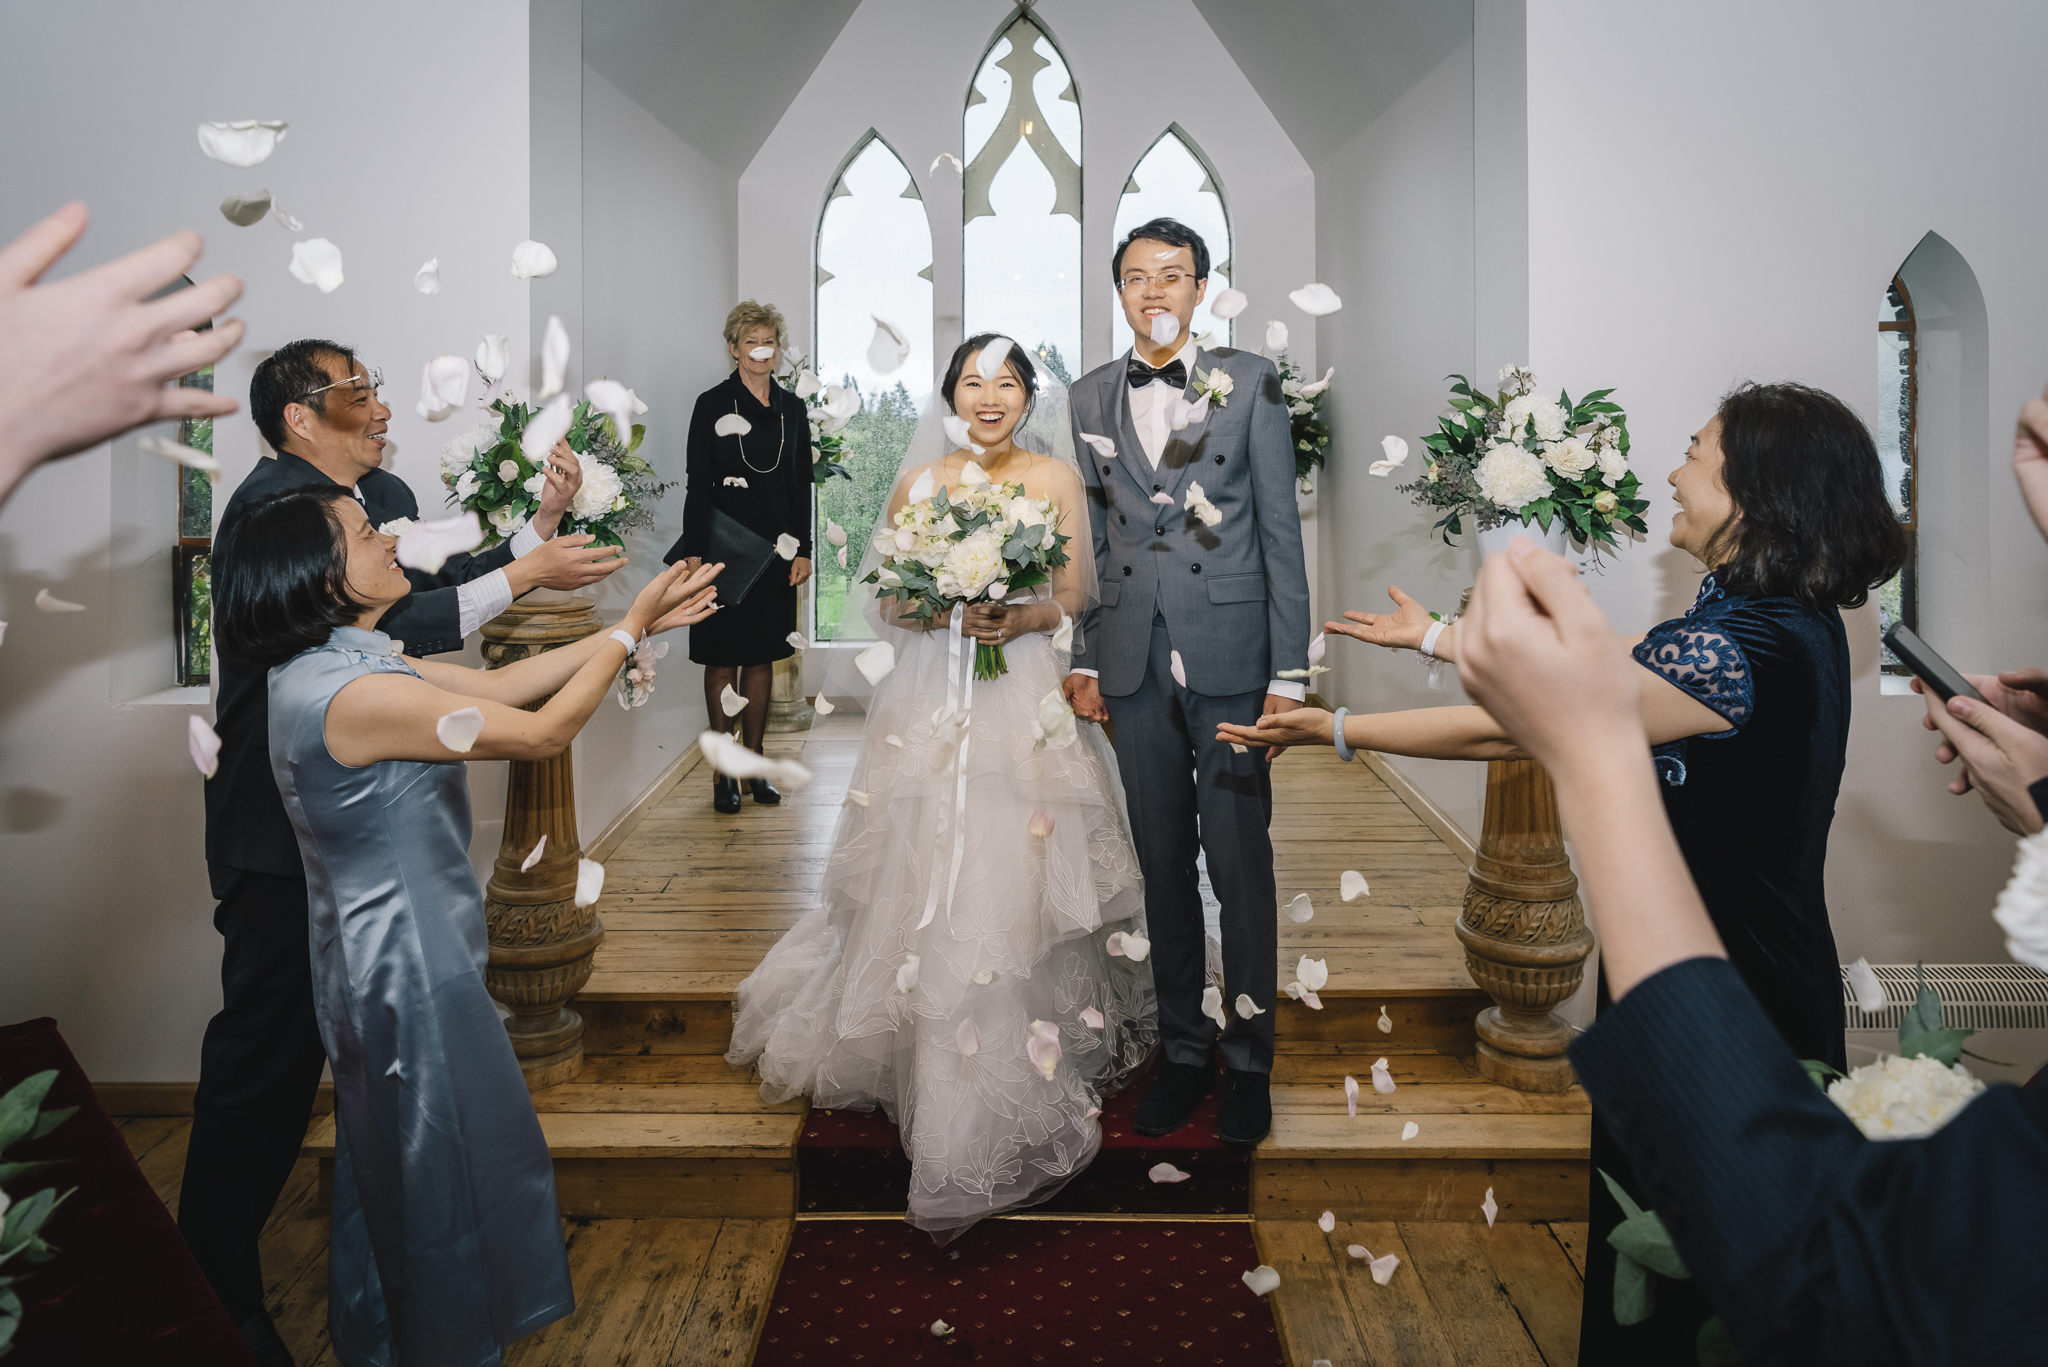 Queenstown Wedding Packages